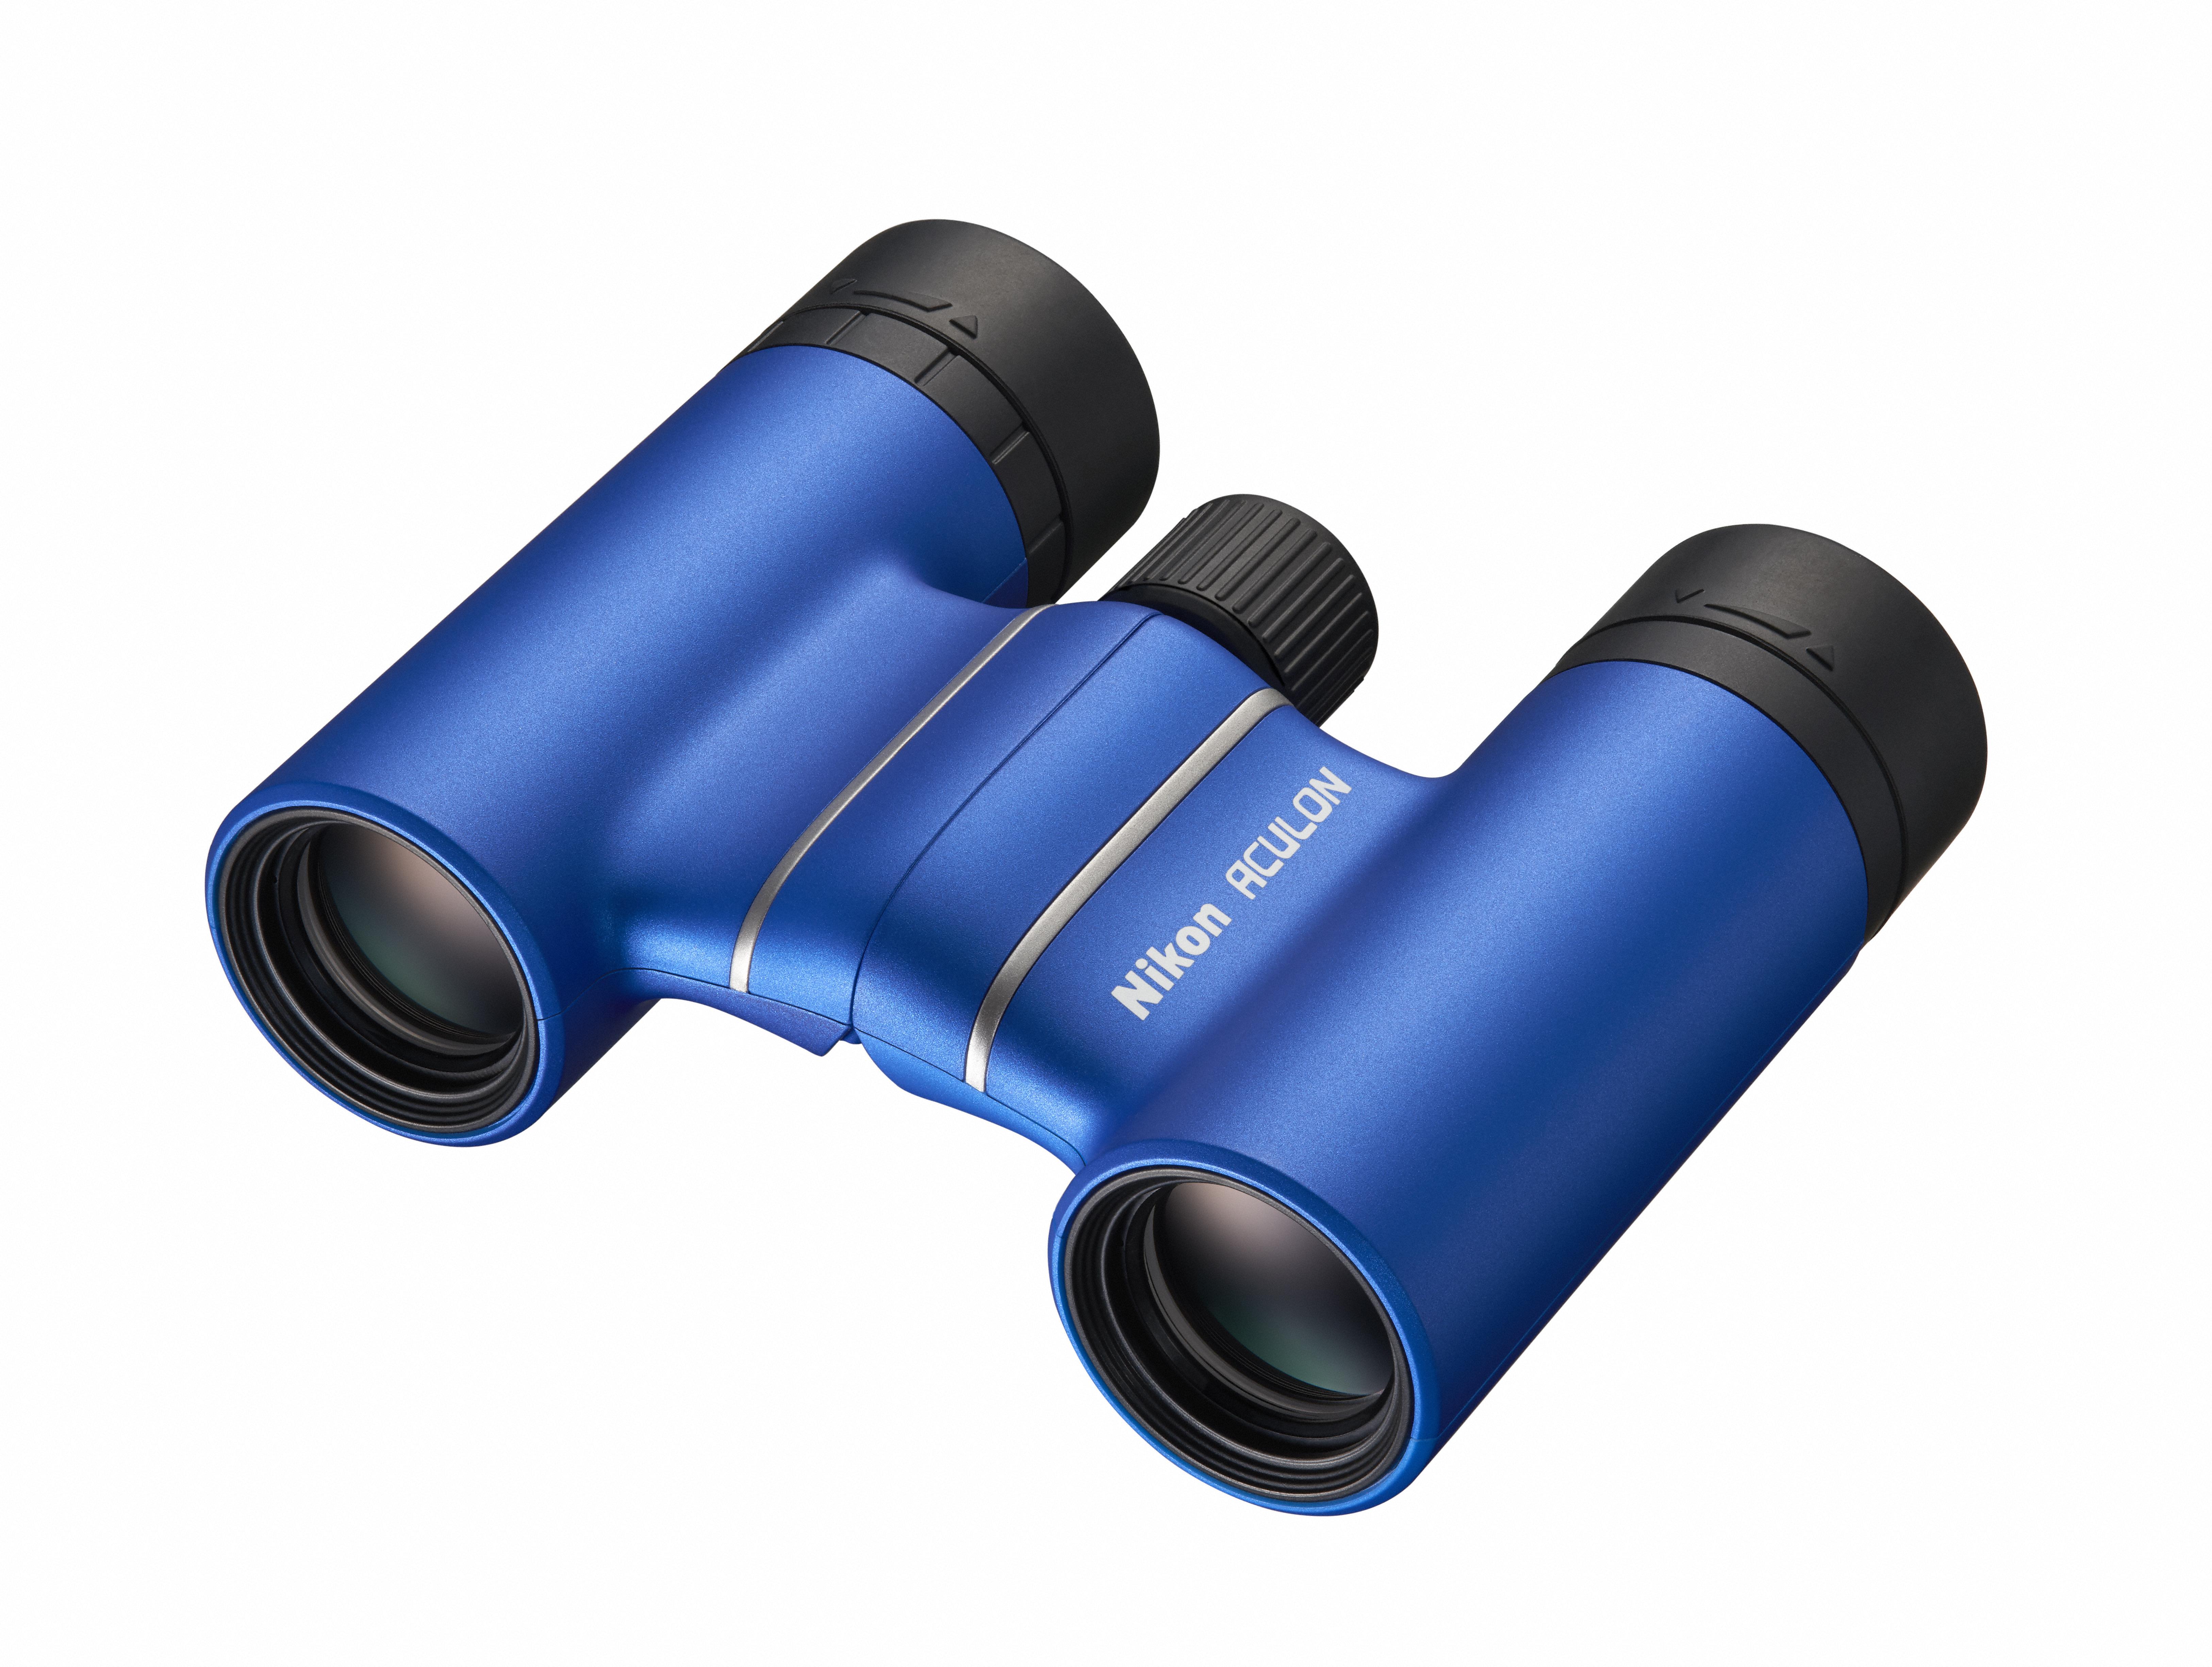 348646 aculon t02 blue front right 637538 original 1583320300